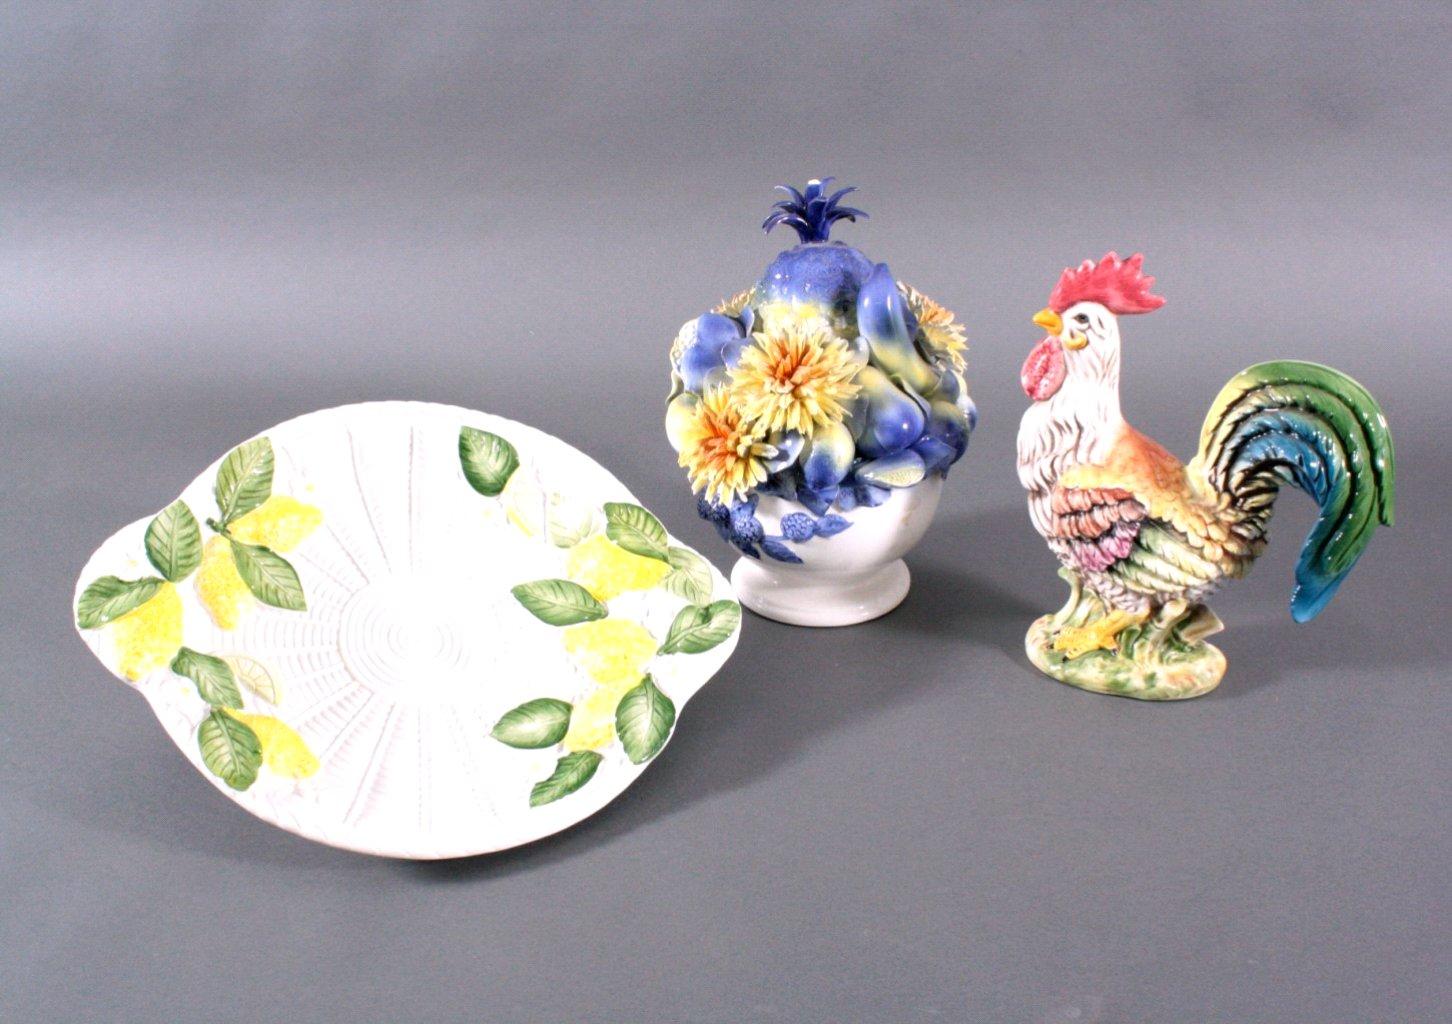 Lot Porzellan und Keramik